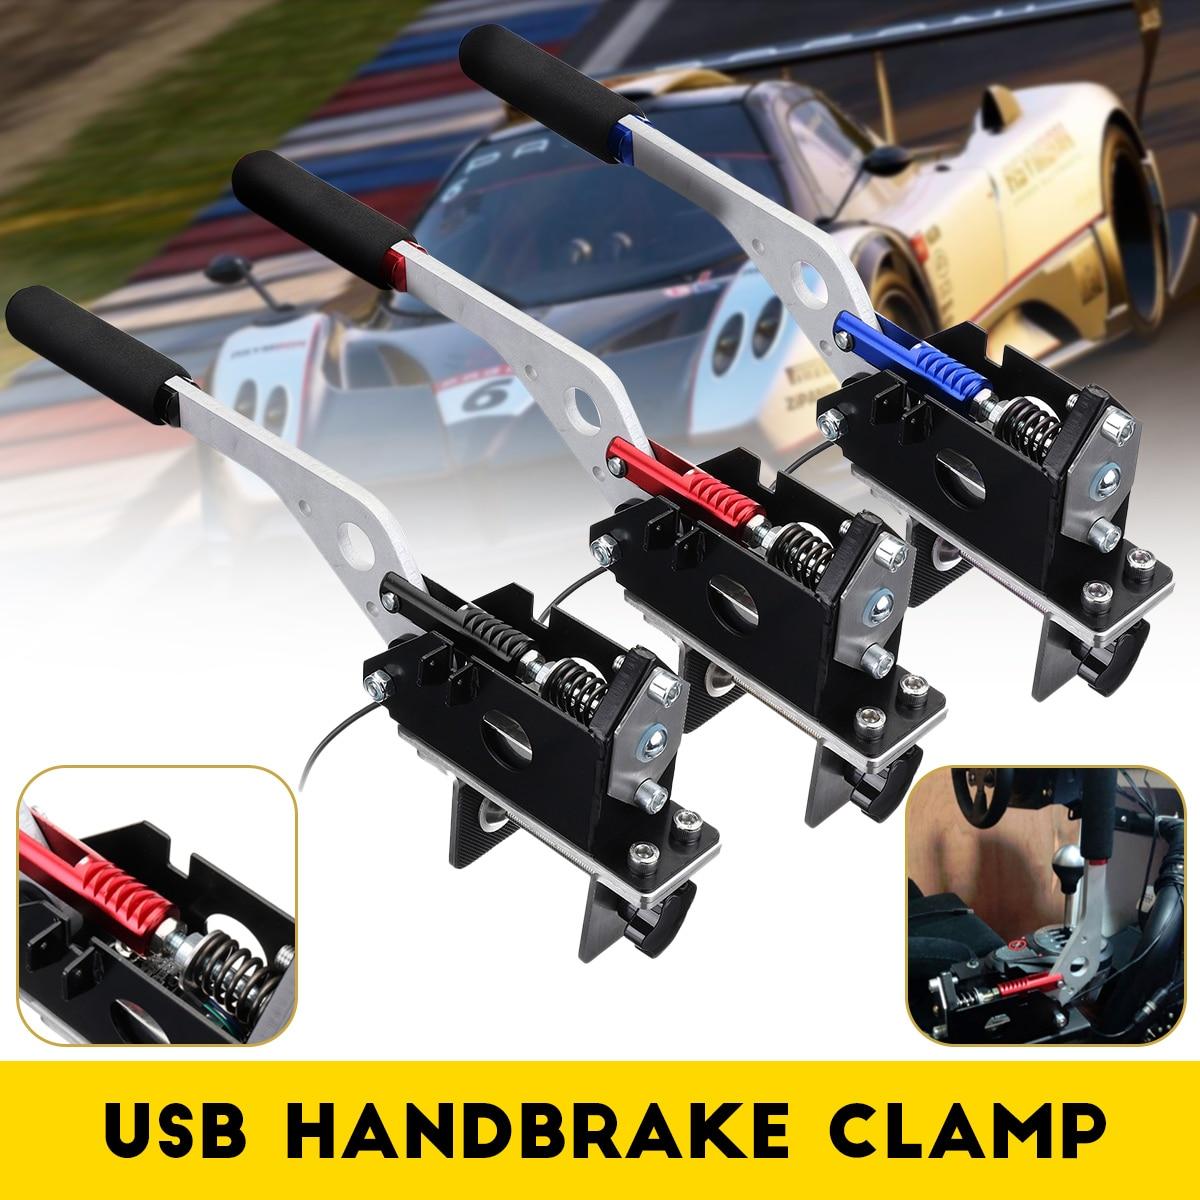 USB Handbremse Handbrake Clamp for Racing Games G25/ 27/29 T500 FANATEC OSW DIRT RALLYUSB Handbremse Handbrake Clamp for Racing Games G25/ 27/29 T500 FANATEC OSW DIRT RALLY